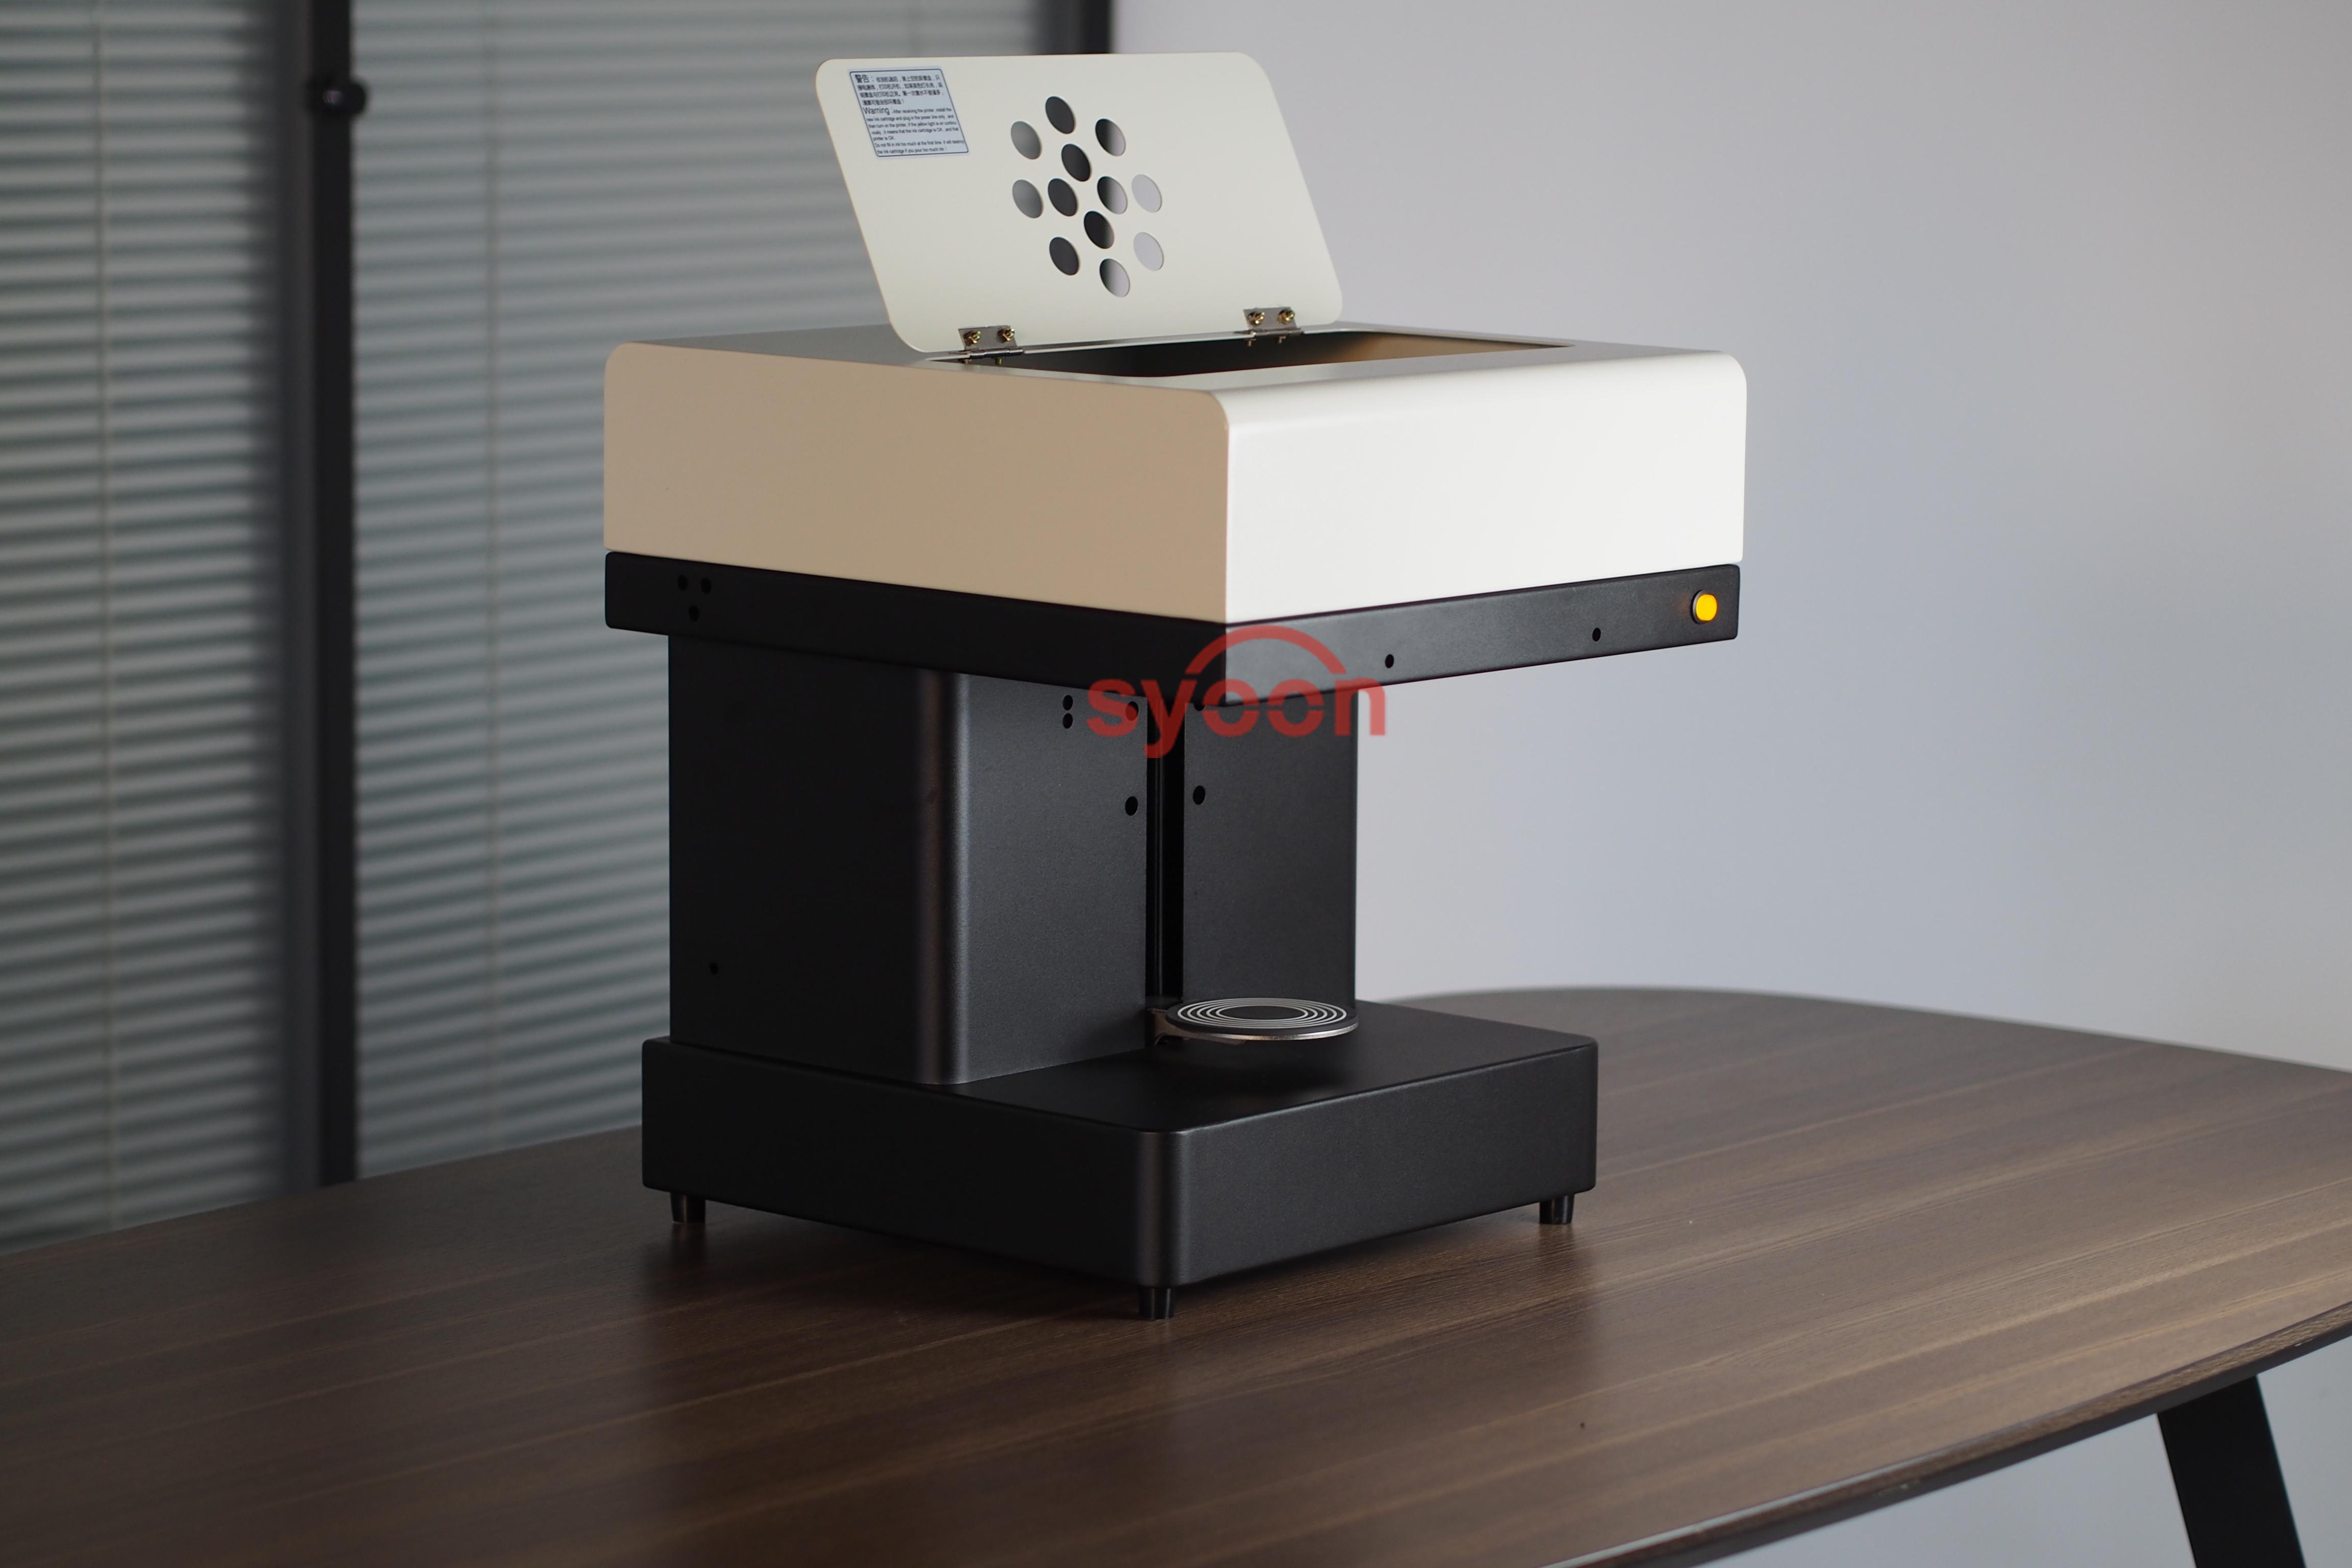 Fabrikant Art Koffie Drankjes Printer Voedsel Printer Chocolade Printer met Voedsel inkt Gratis Factory Supply met CE